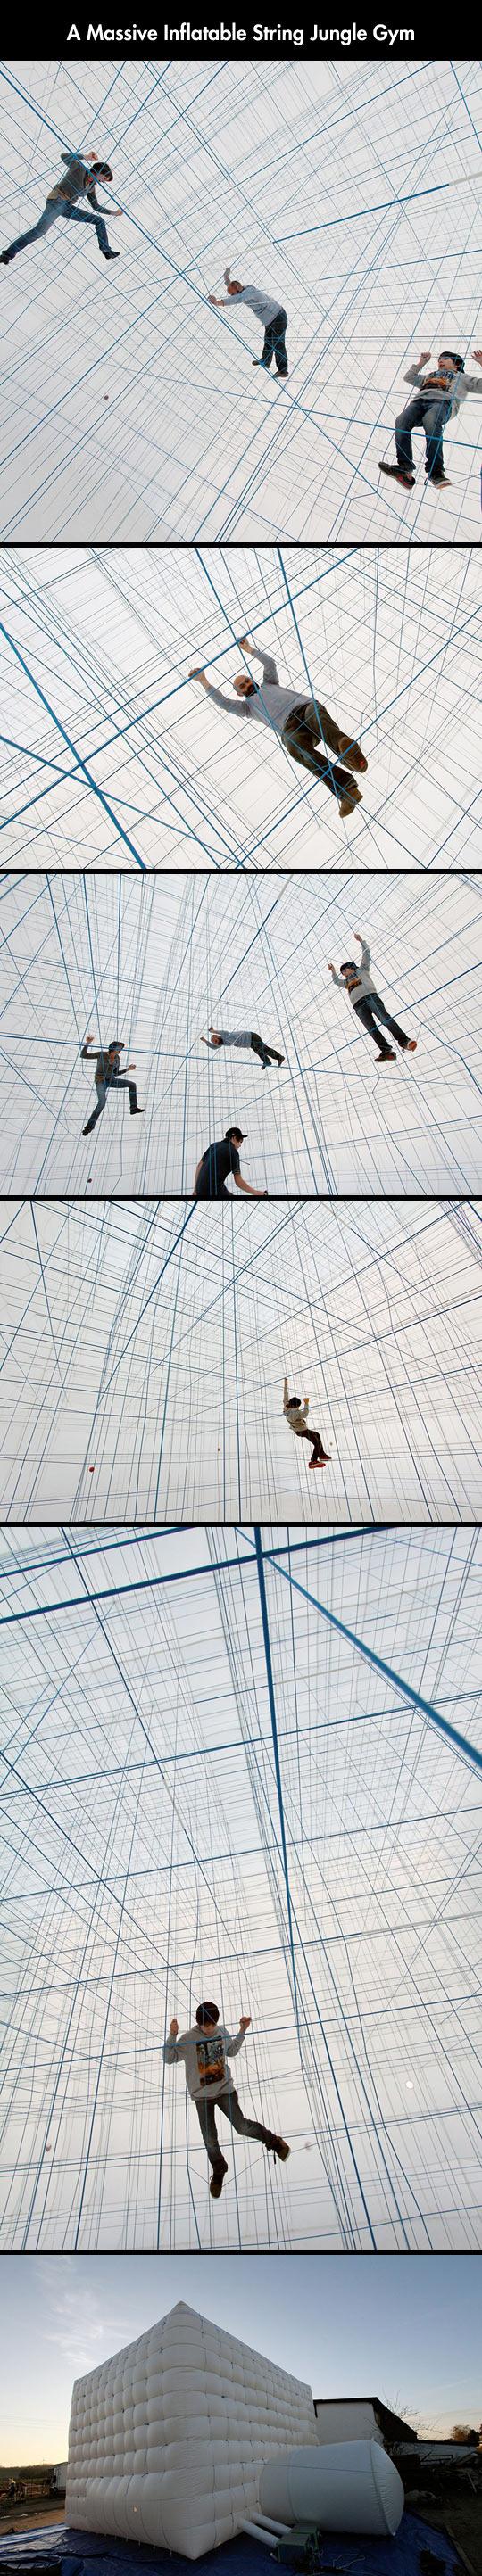 cool-string-jungle-gym-playground